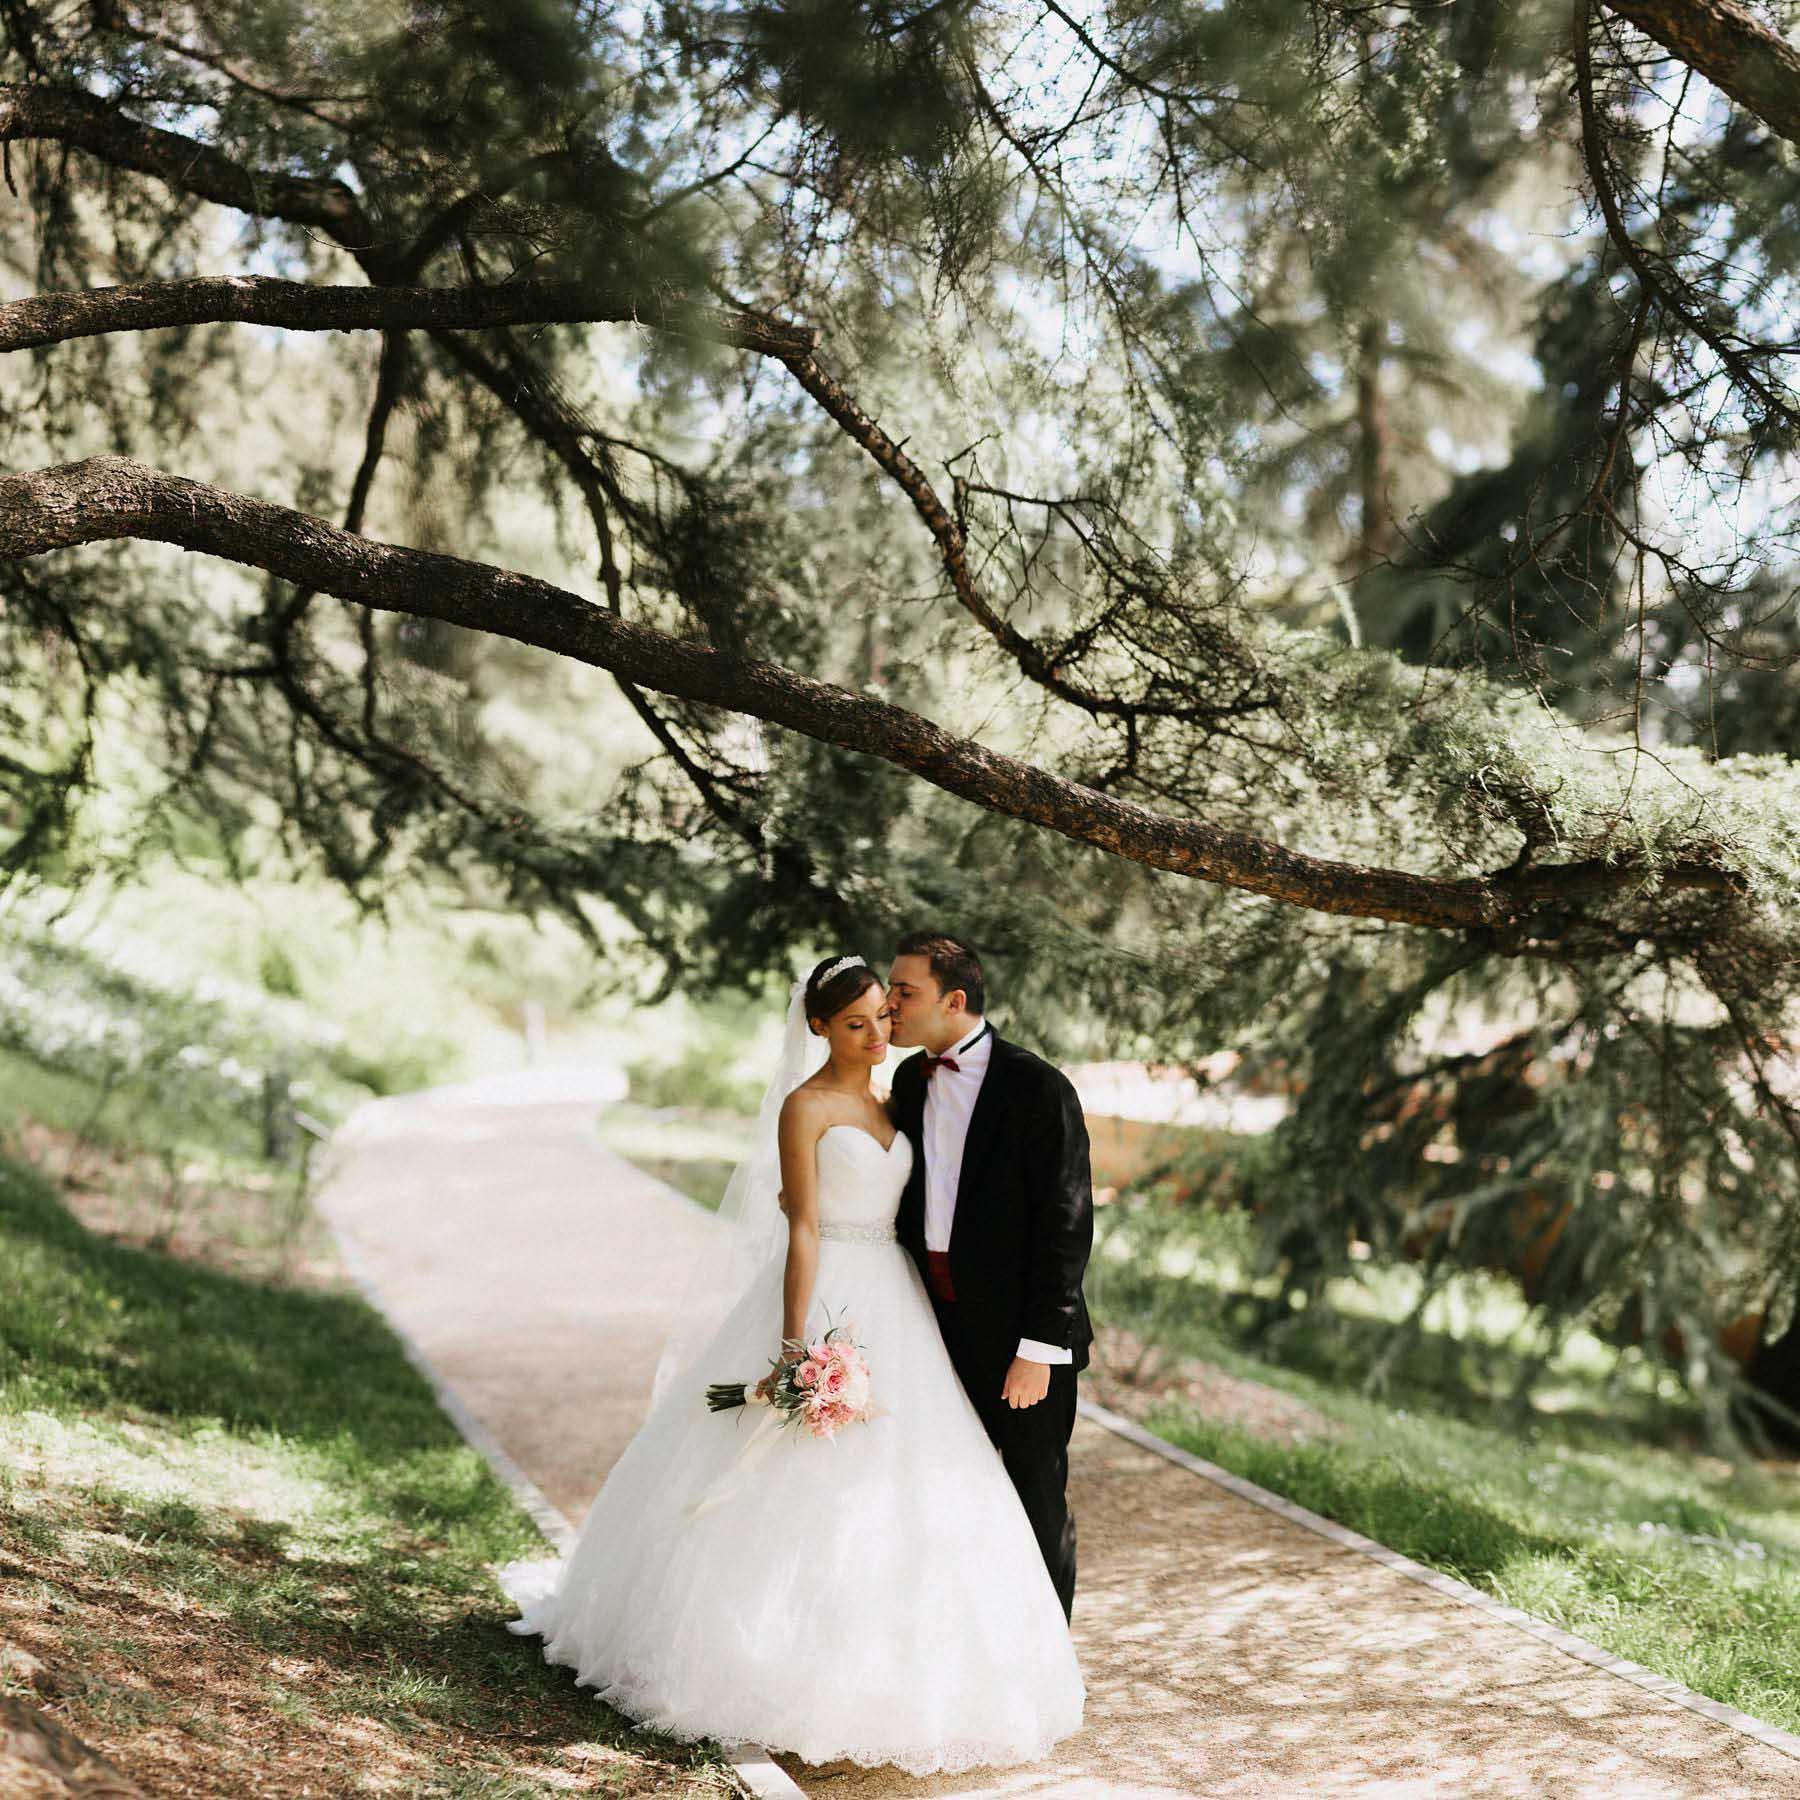 fotografo de bodas Jairo Crena-195